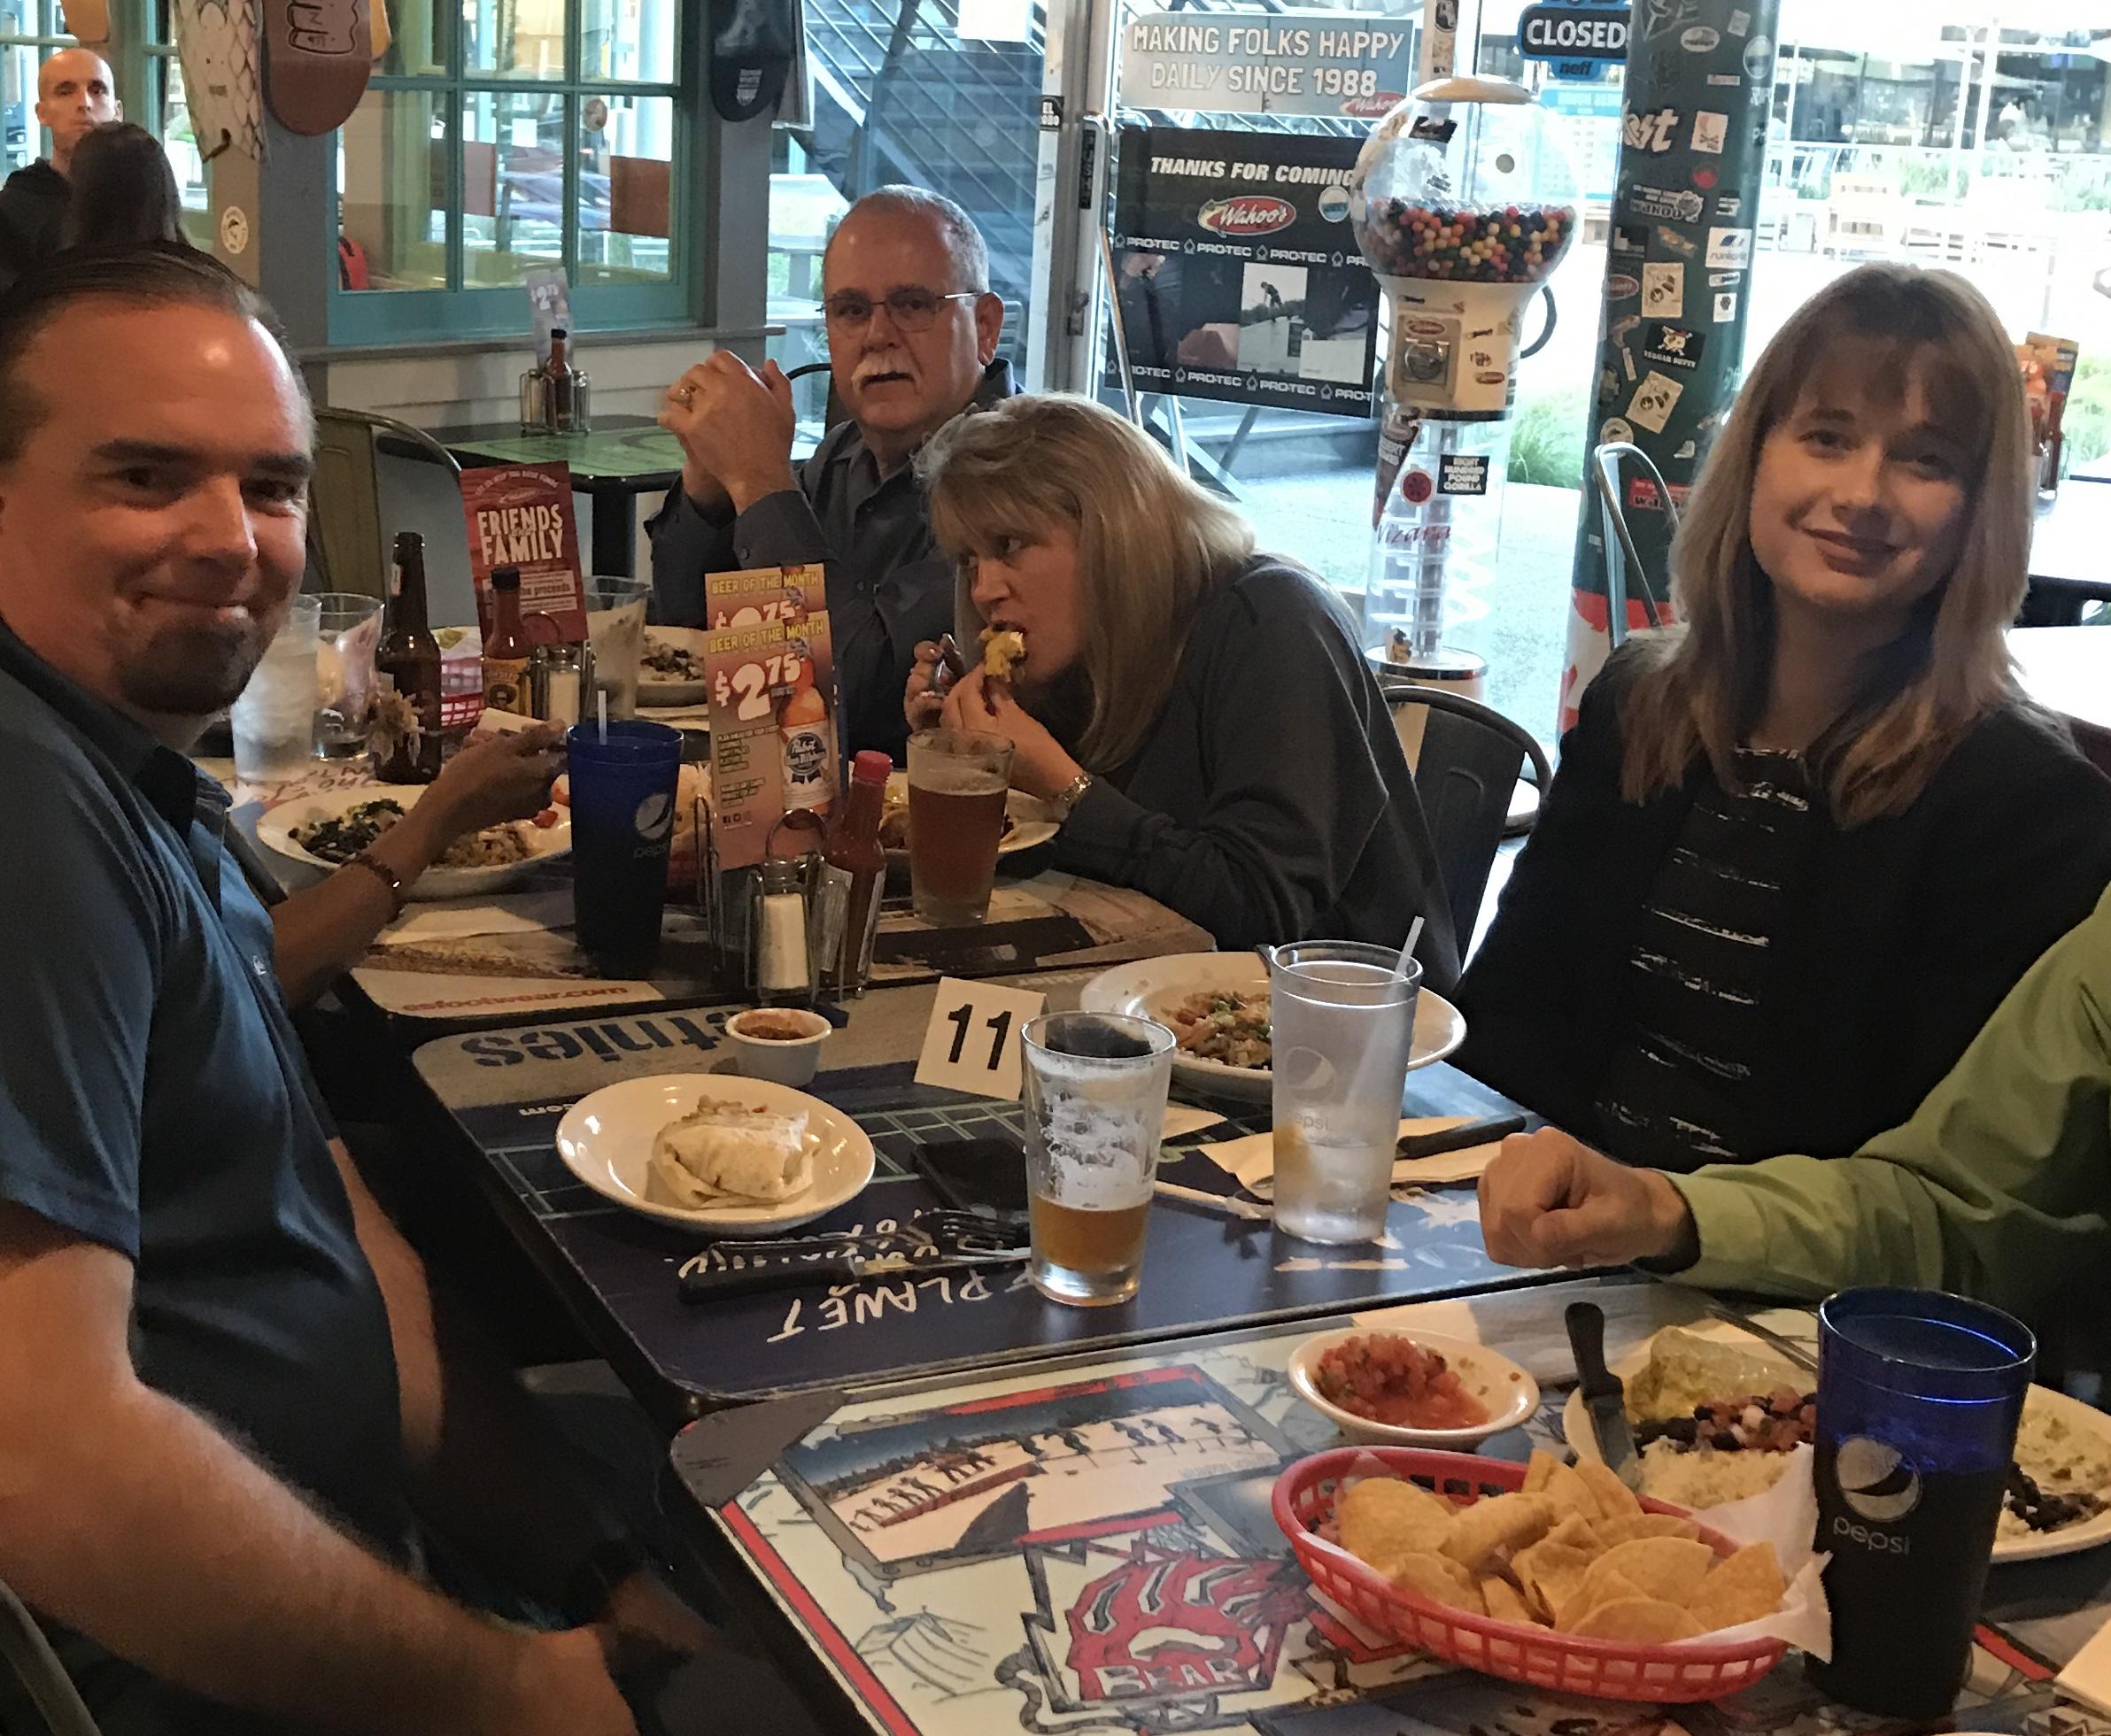 KCCD at dinner 2 April 6 2017